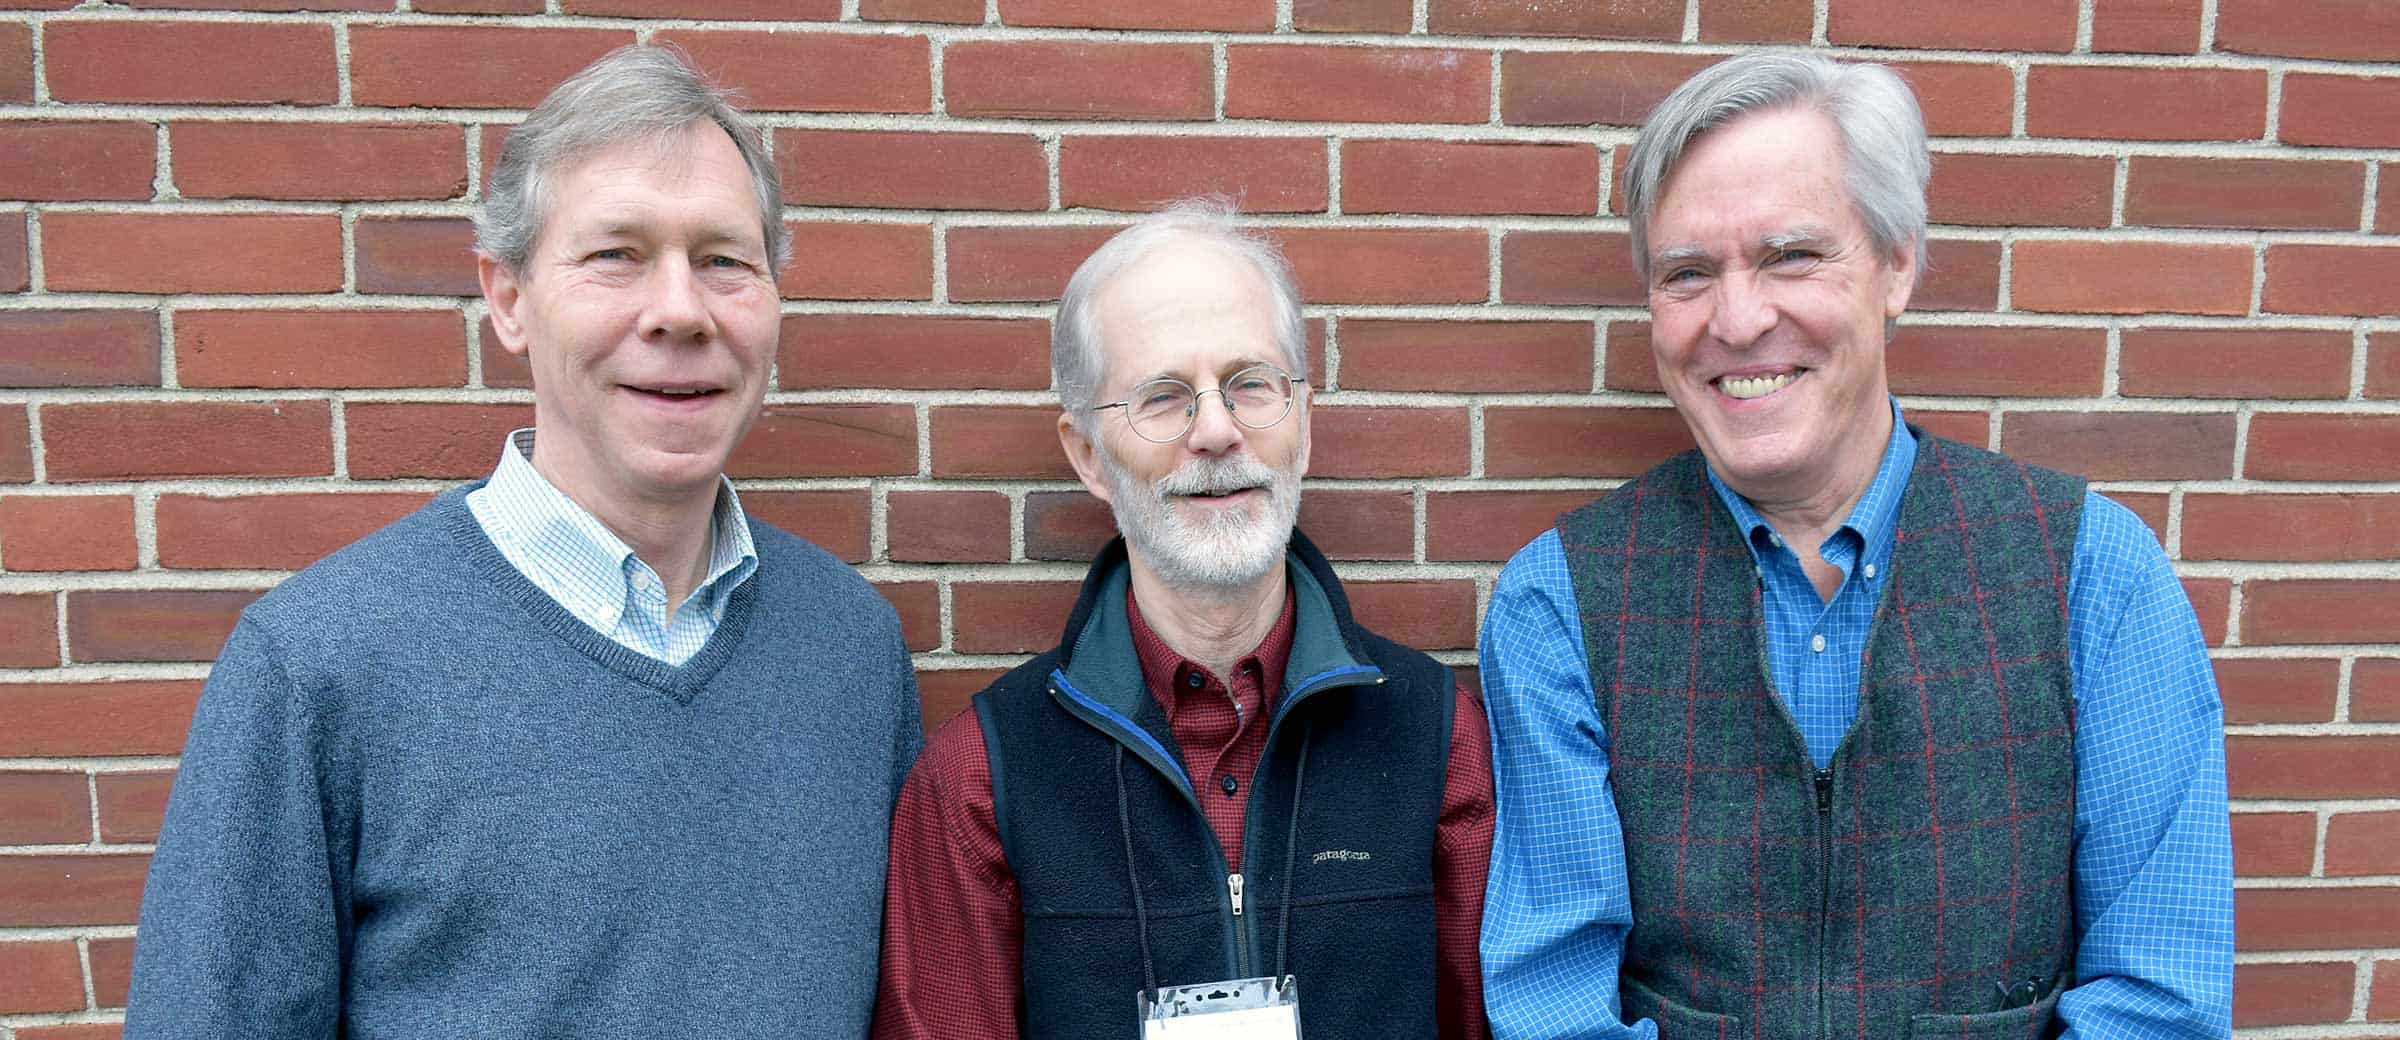 Jay Espy, Burnham Martin, and Tim Glidden